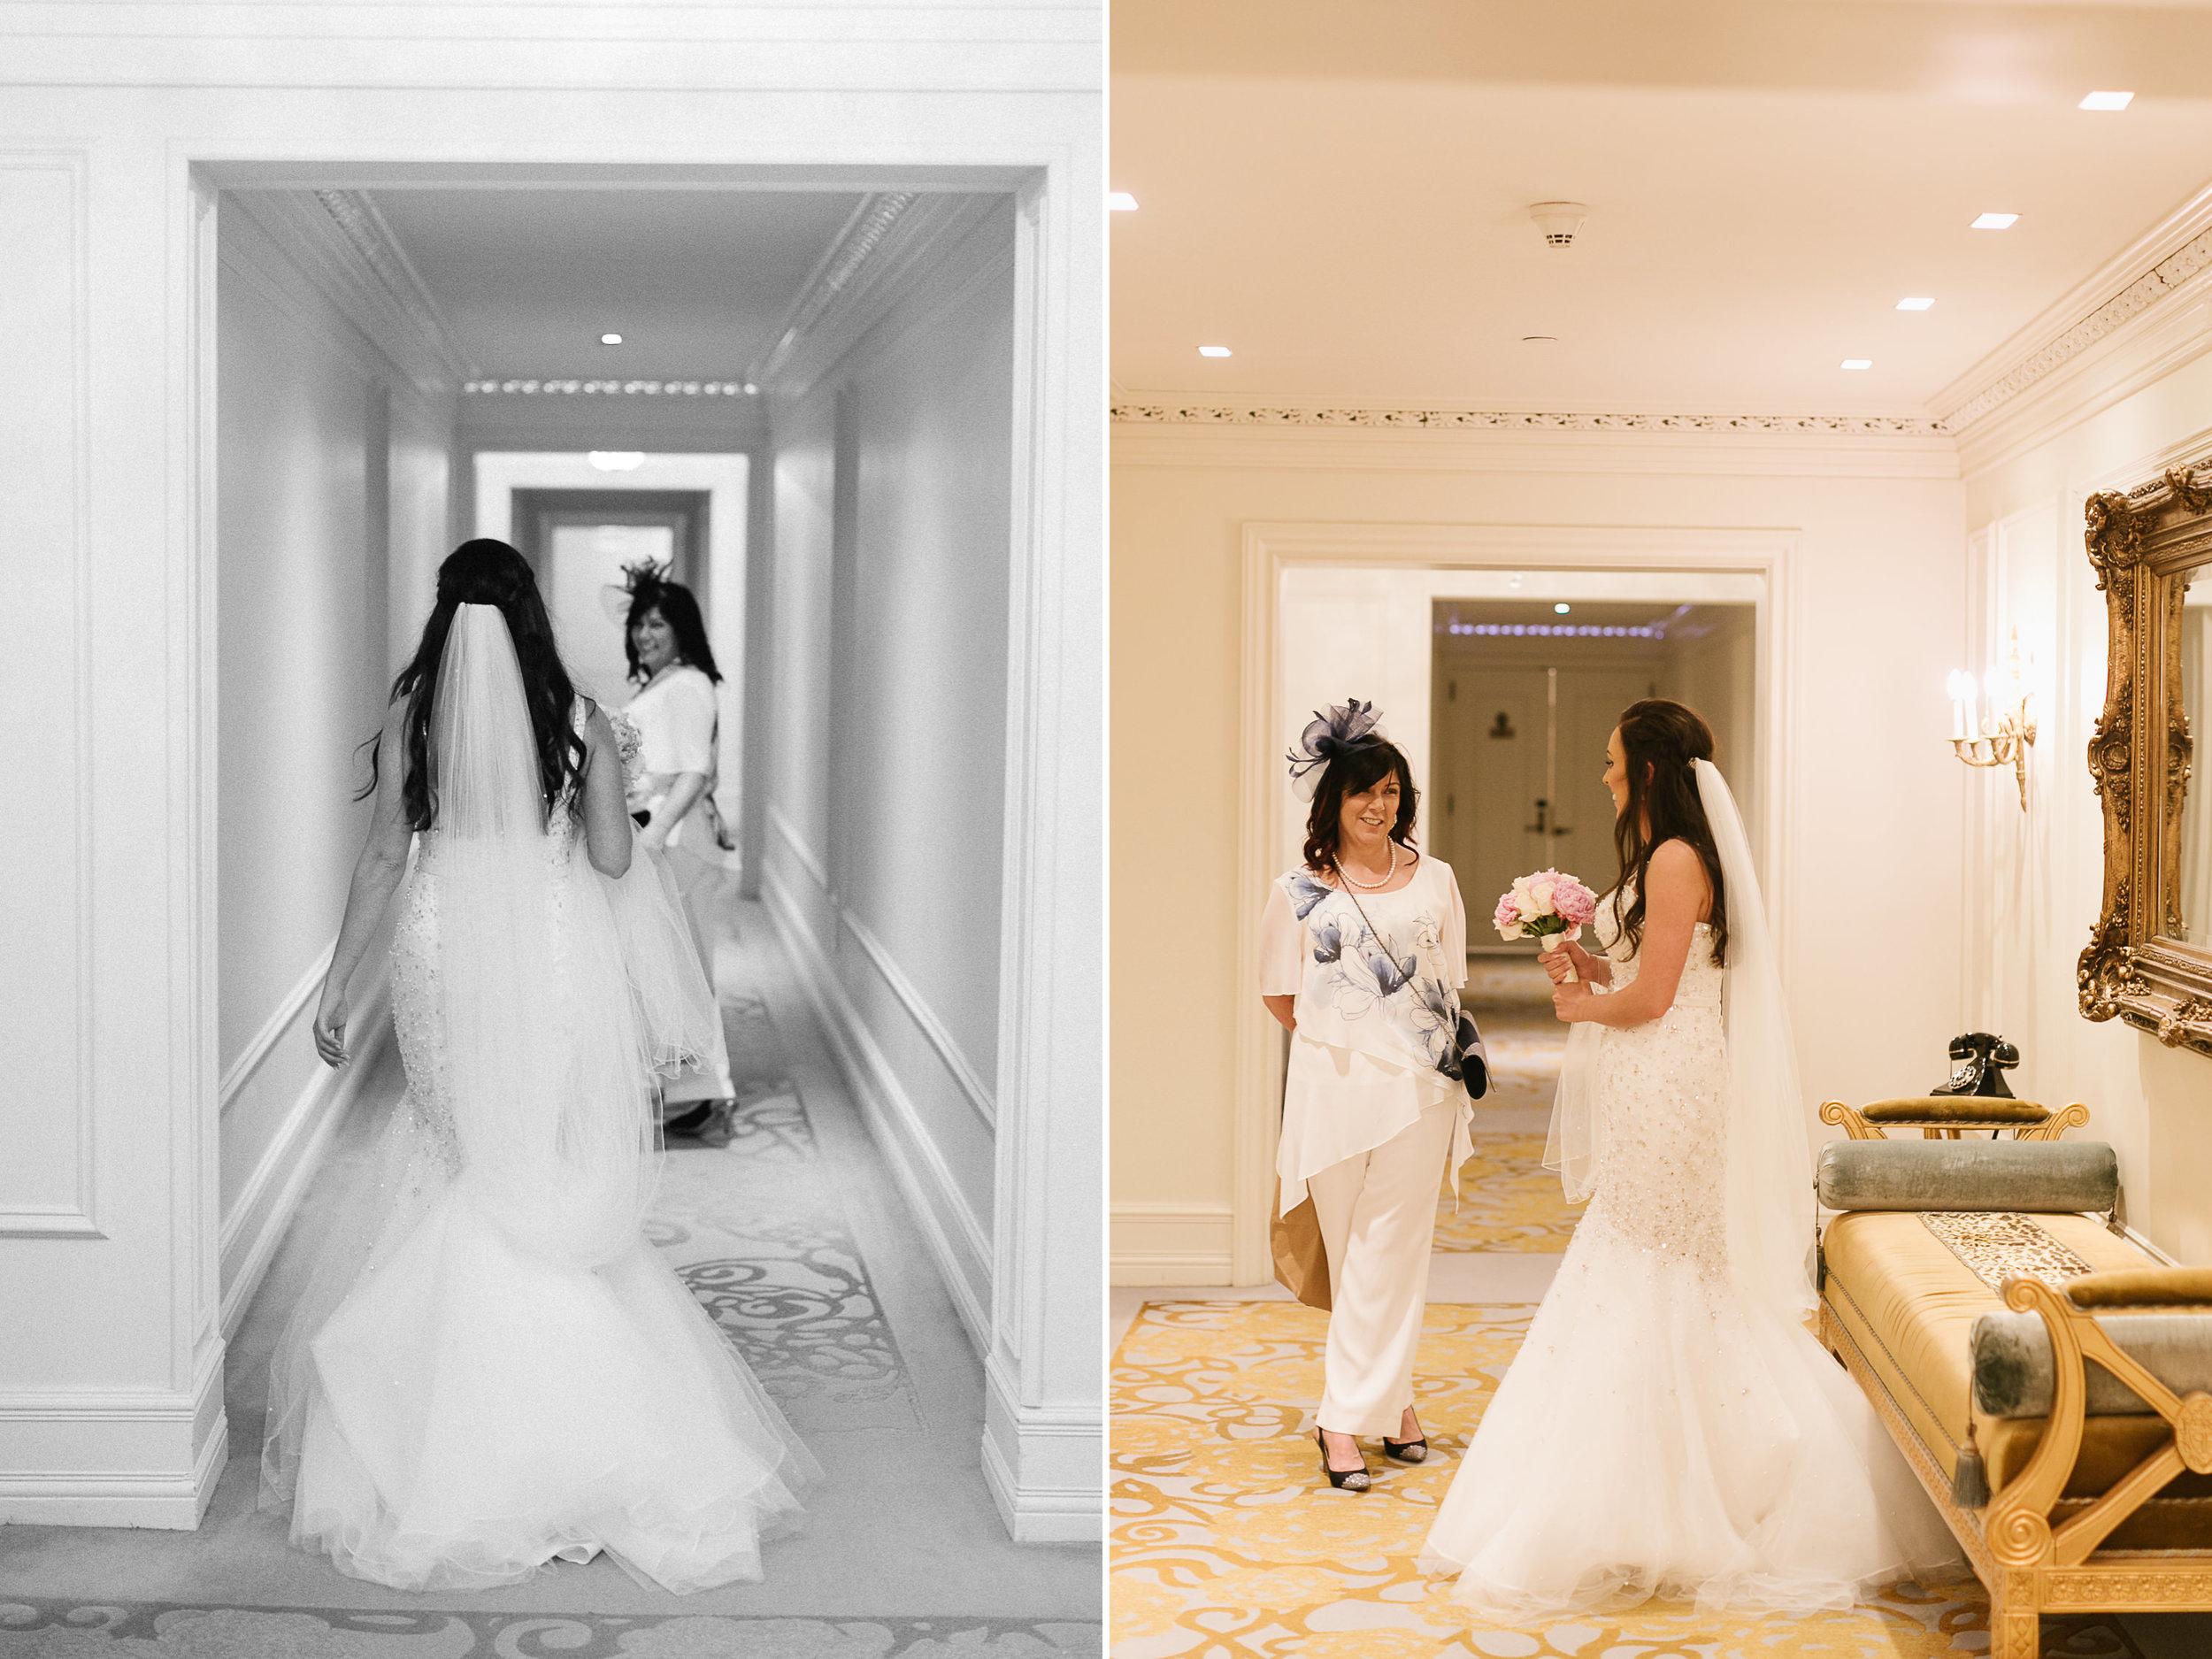 Plaza-hotel-central-park-wedding-A&M-14.jpg